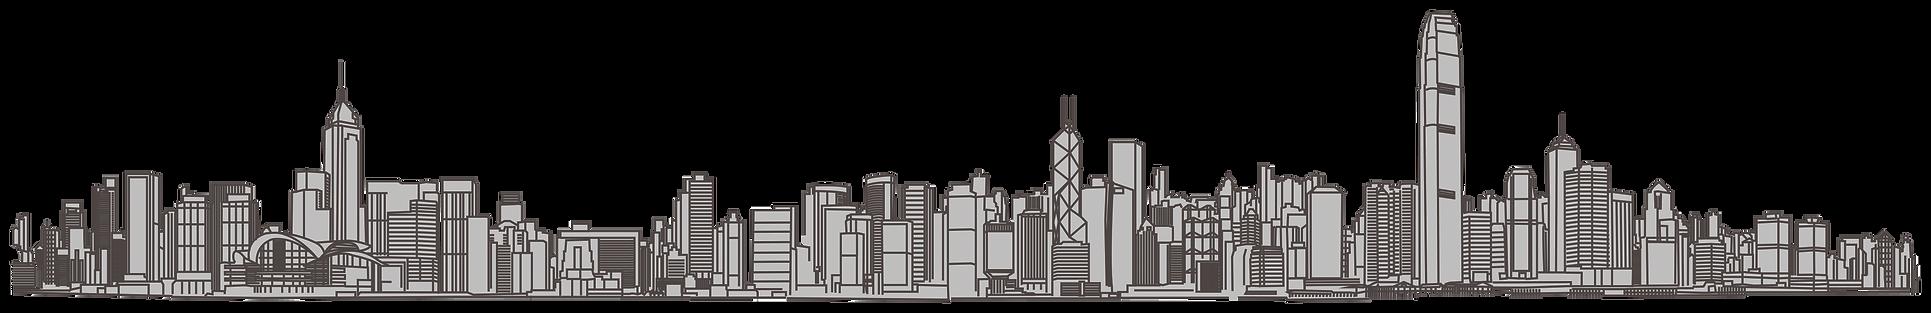 hongkong_building.png